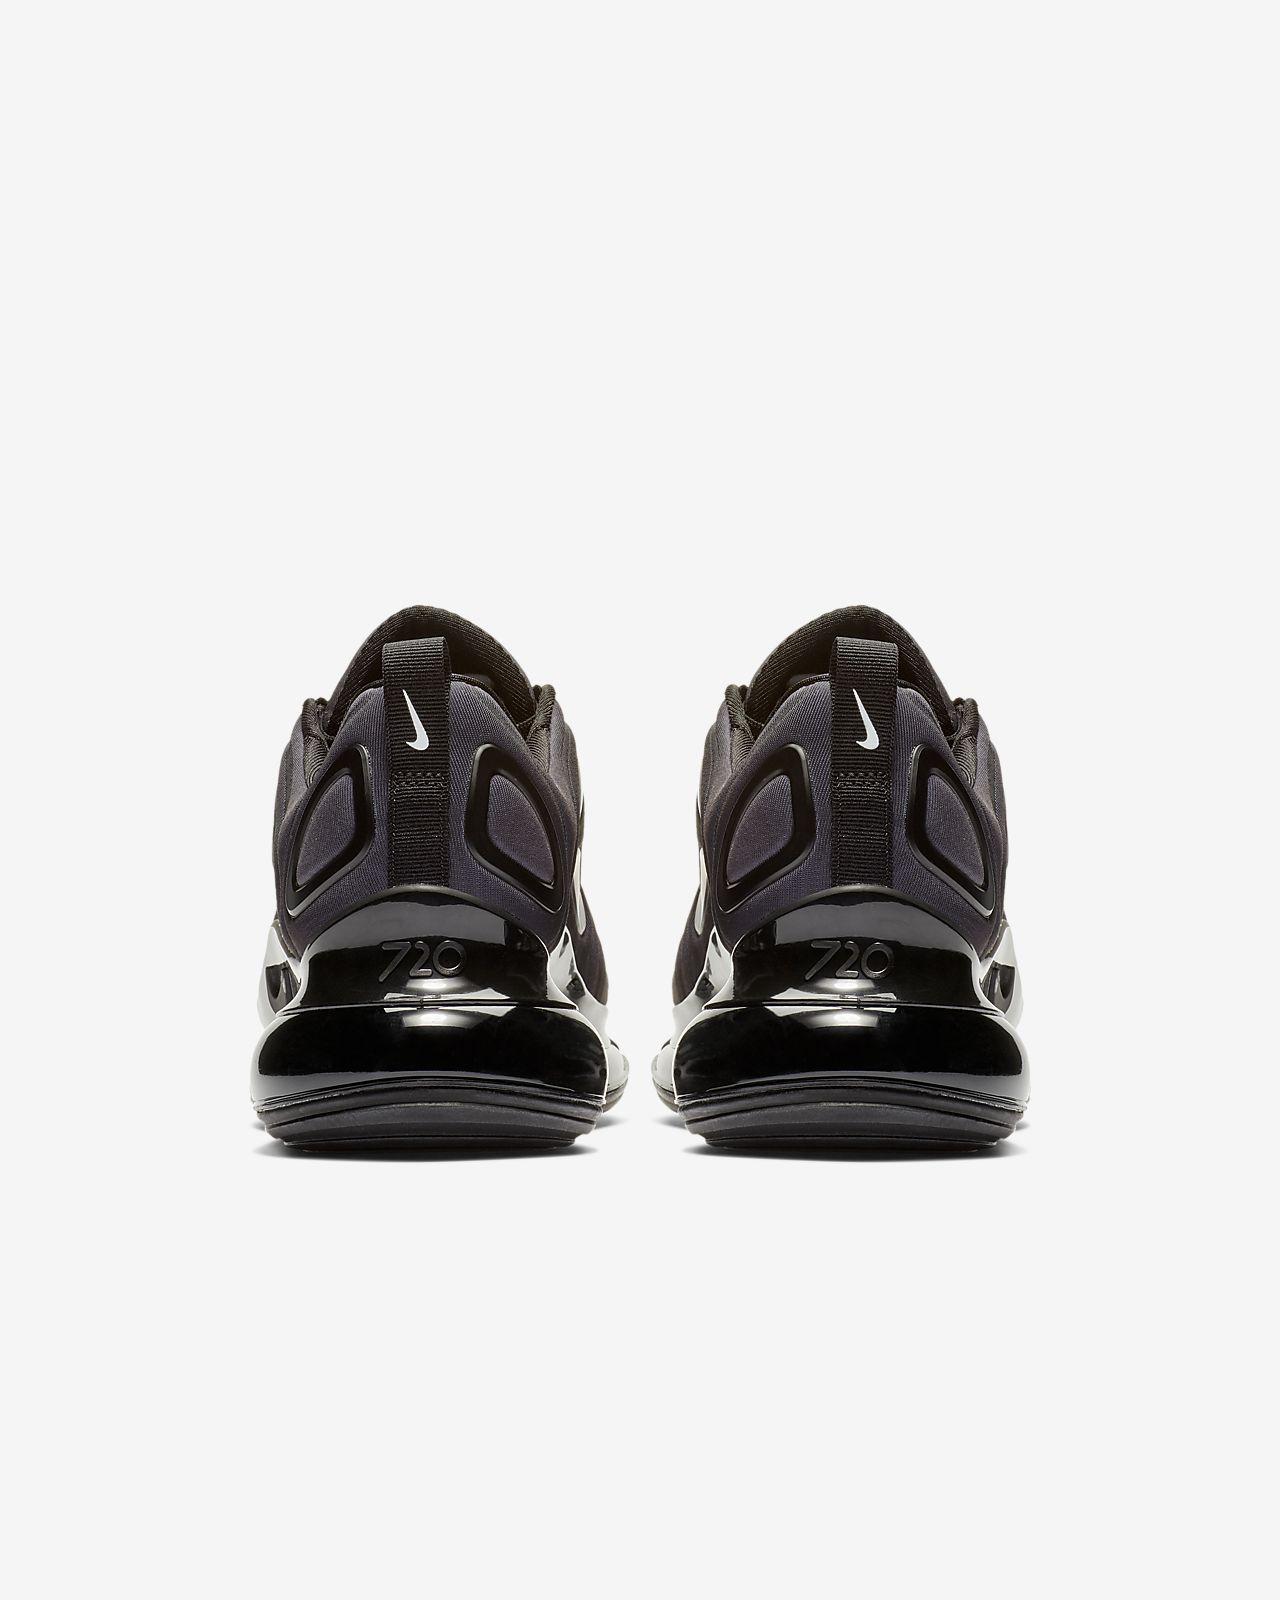 promo code 6abc4 16771 ... Chaussure Nike Air Max 720 pour Femme